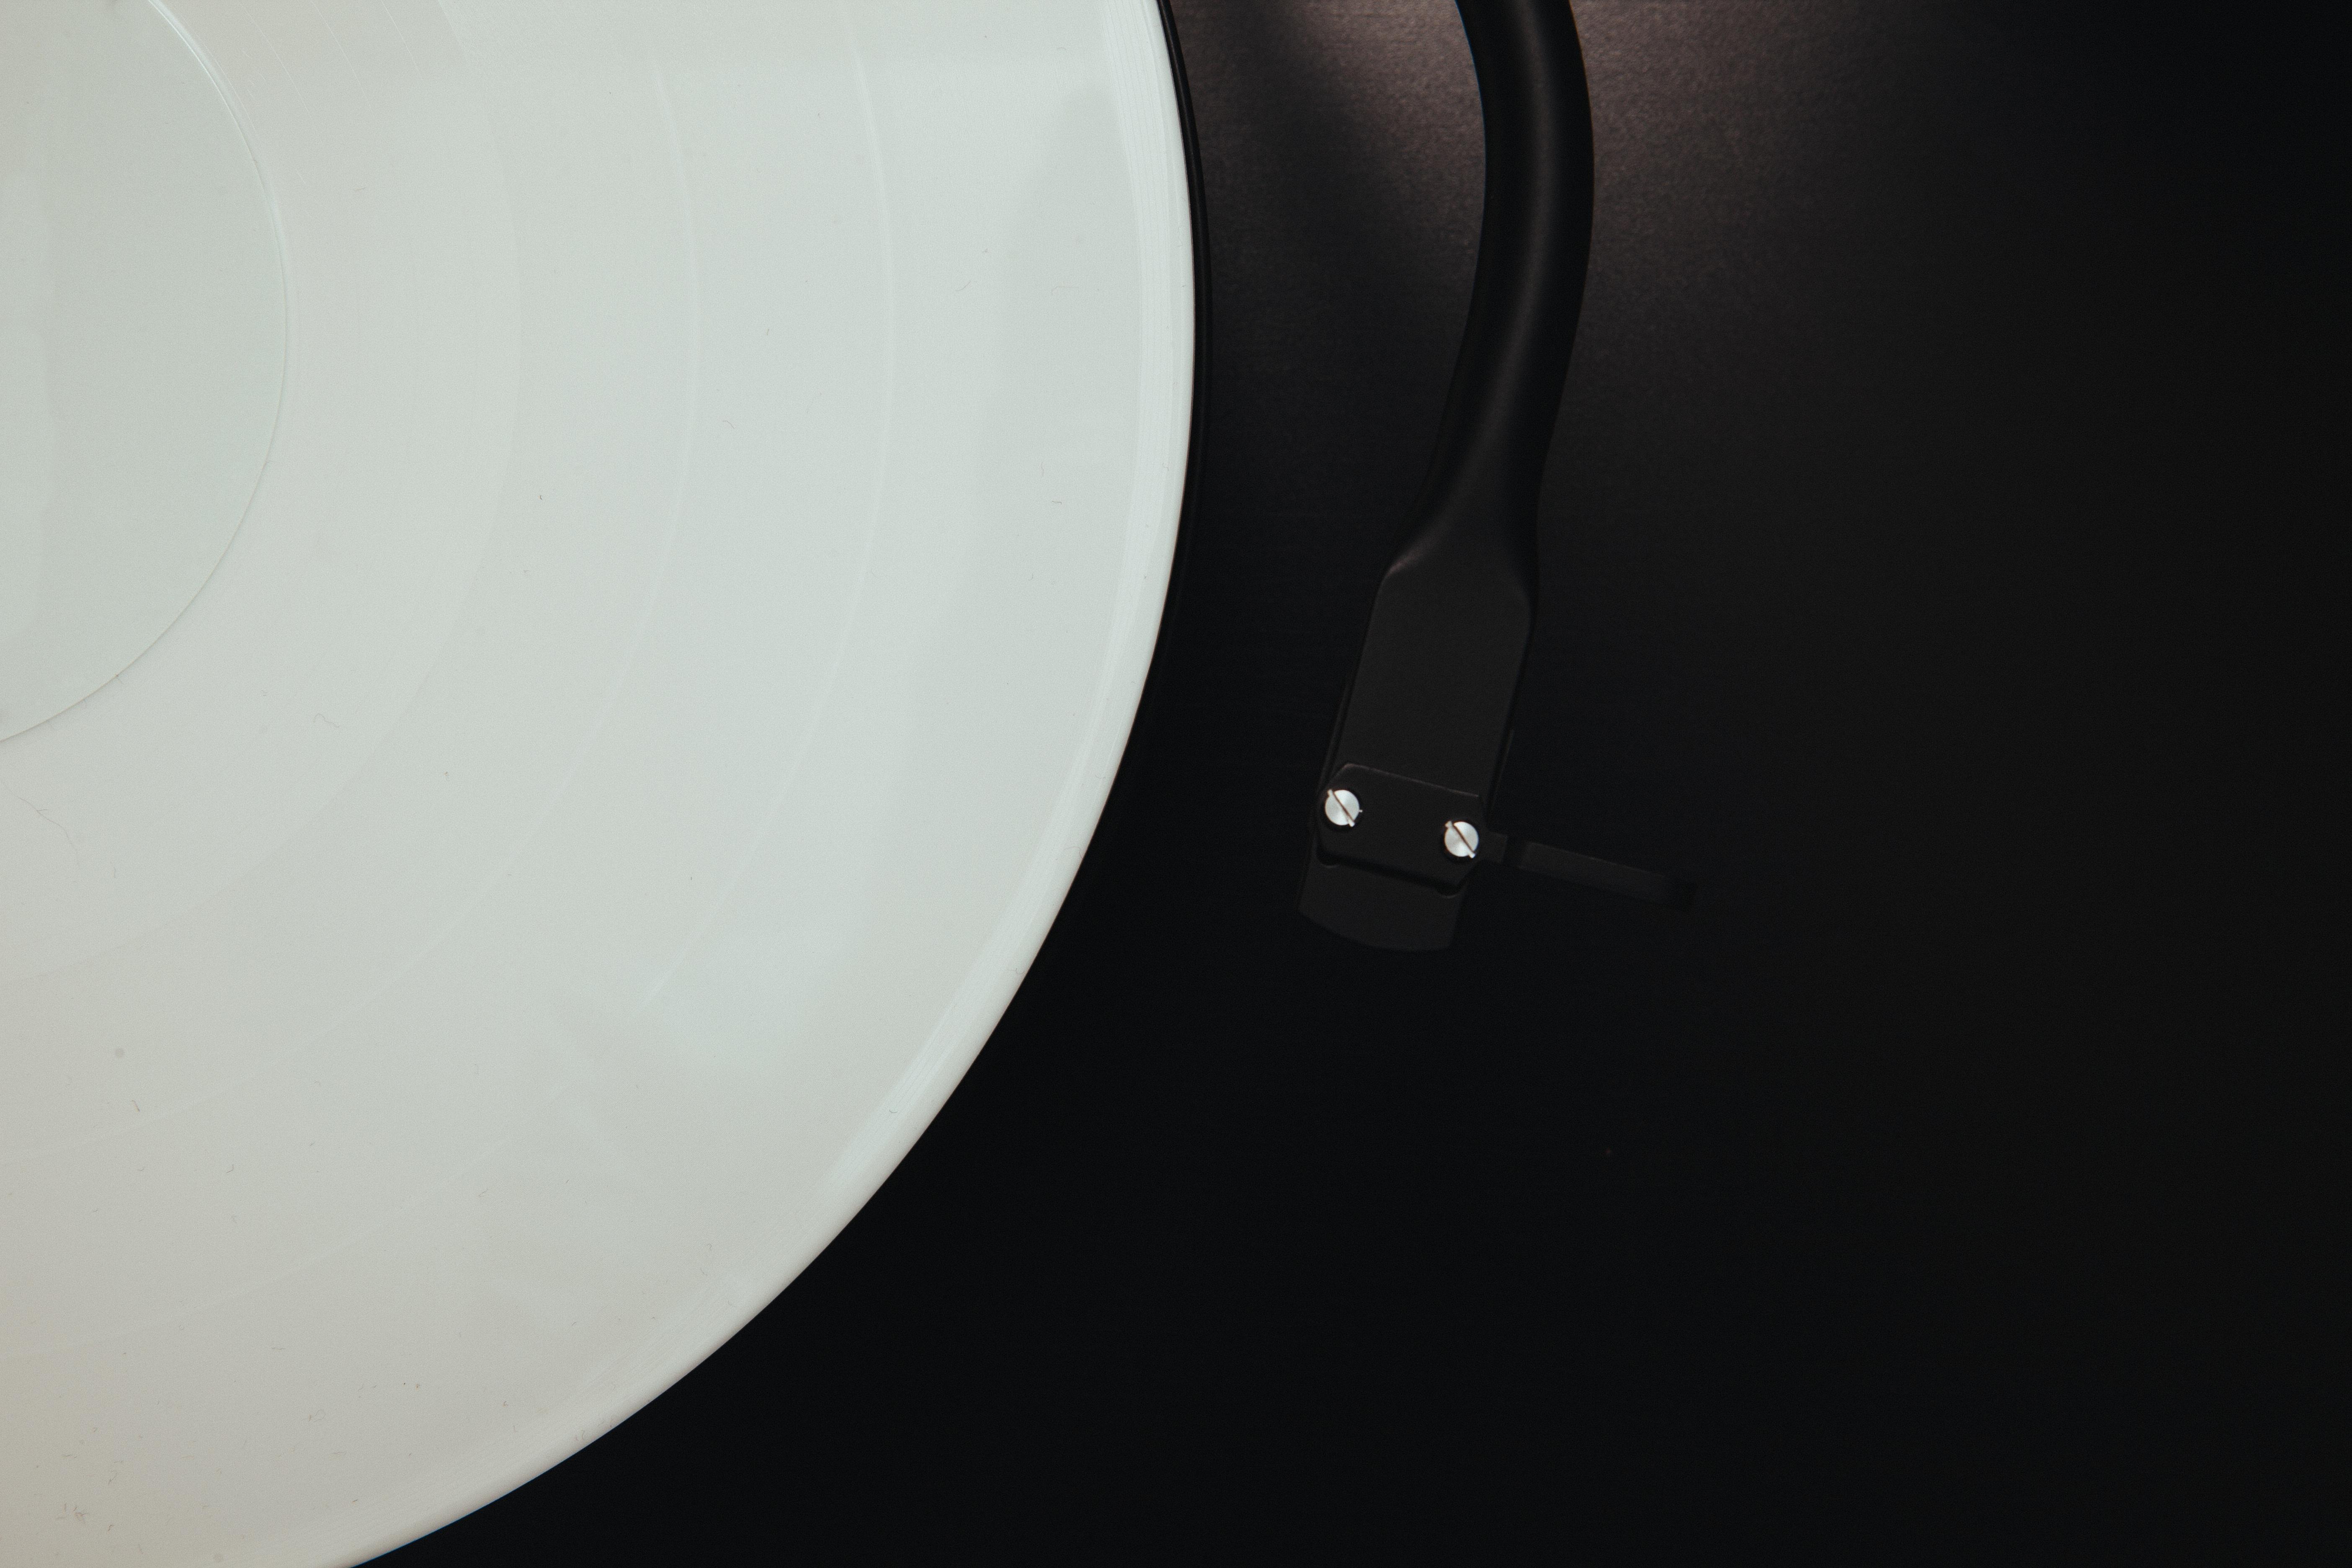 Record Music Needle Vinyl Turntable Light White Ceiling Gadget Lamp Black  Lighting Circle Dj Album Audio